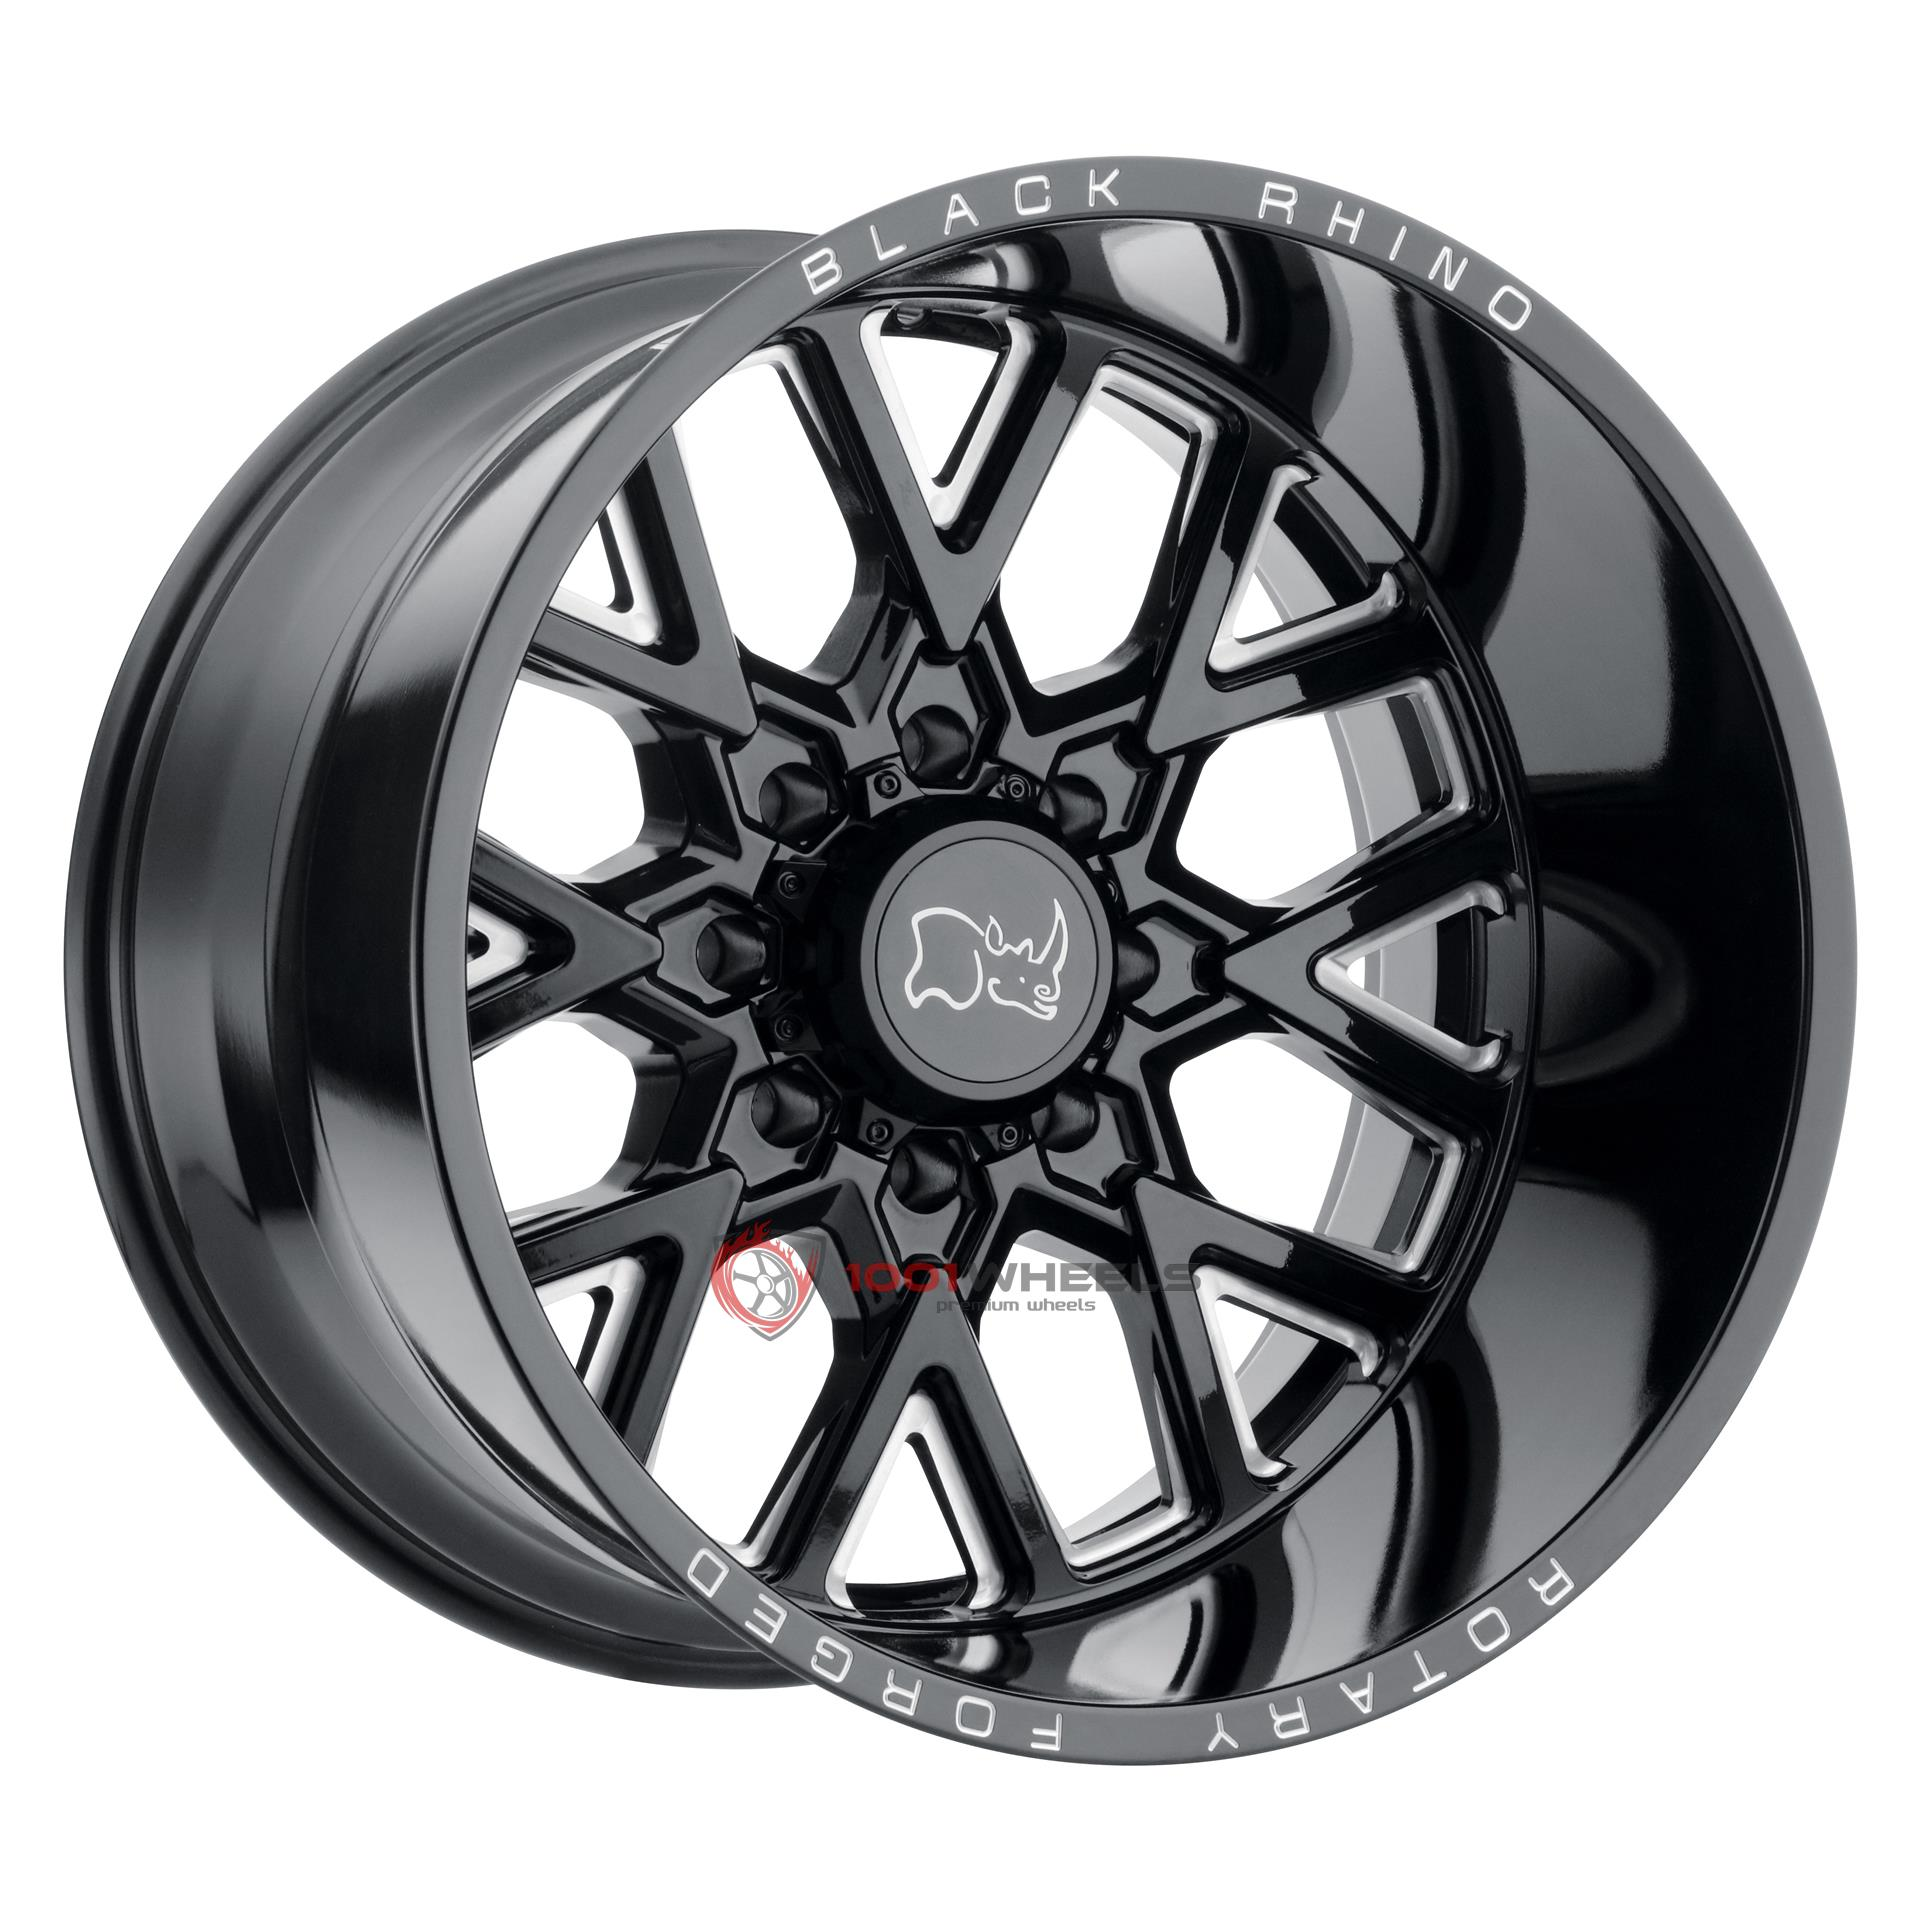 BLACK RHINO GRIMLOCK gloss-black-wmilled-spokes